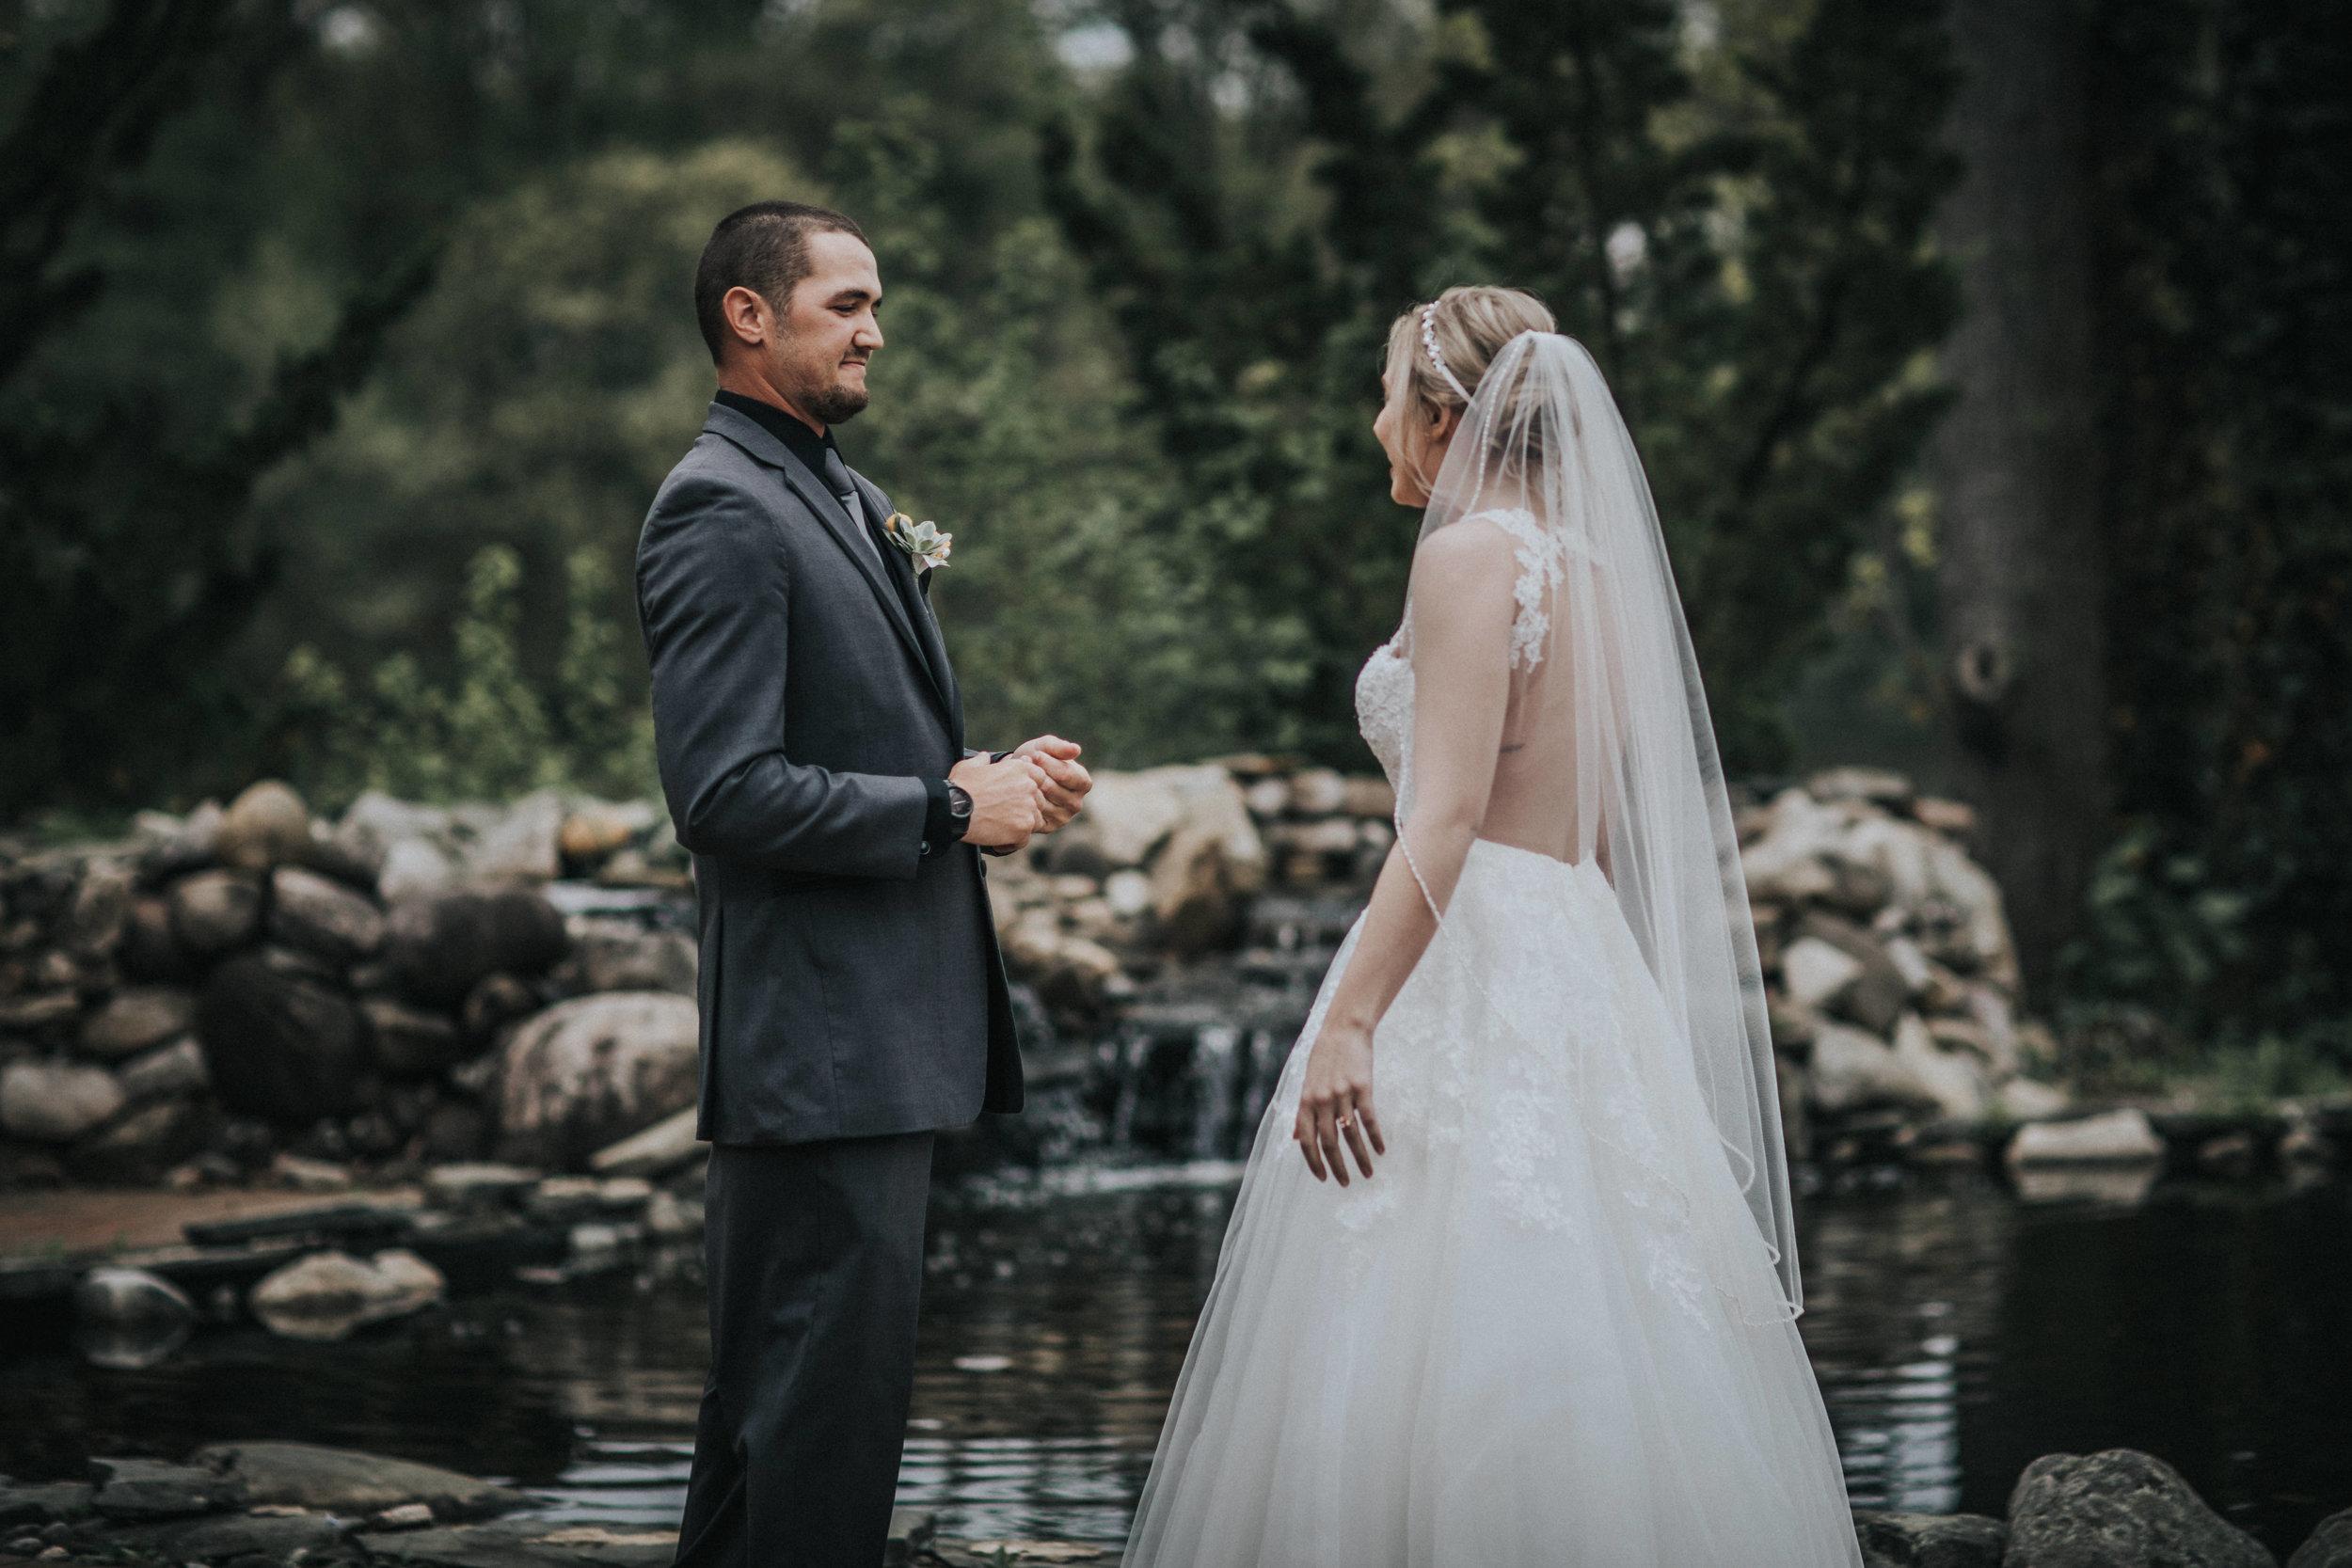 New-Jersey-Wedding-Photographer-Megan&Nick-FirstLooks-49.jpg